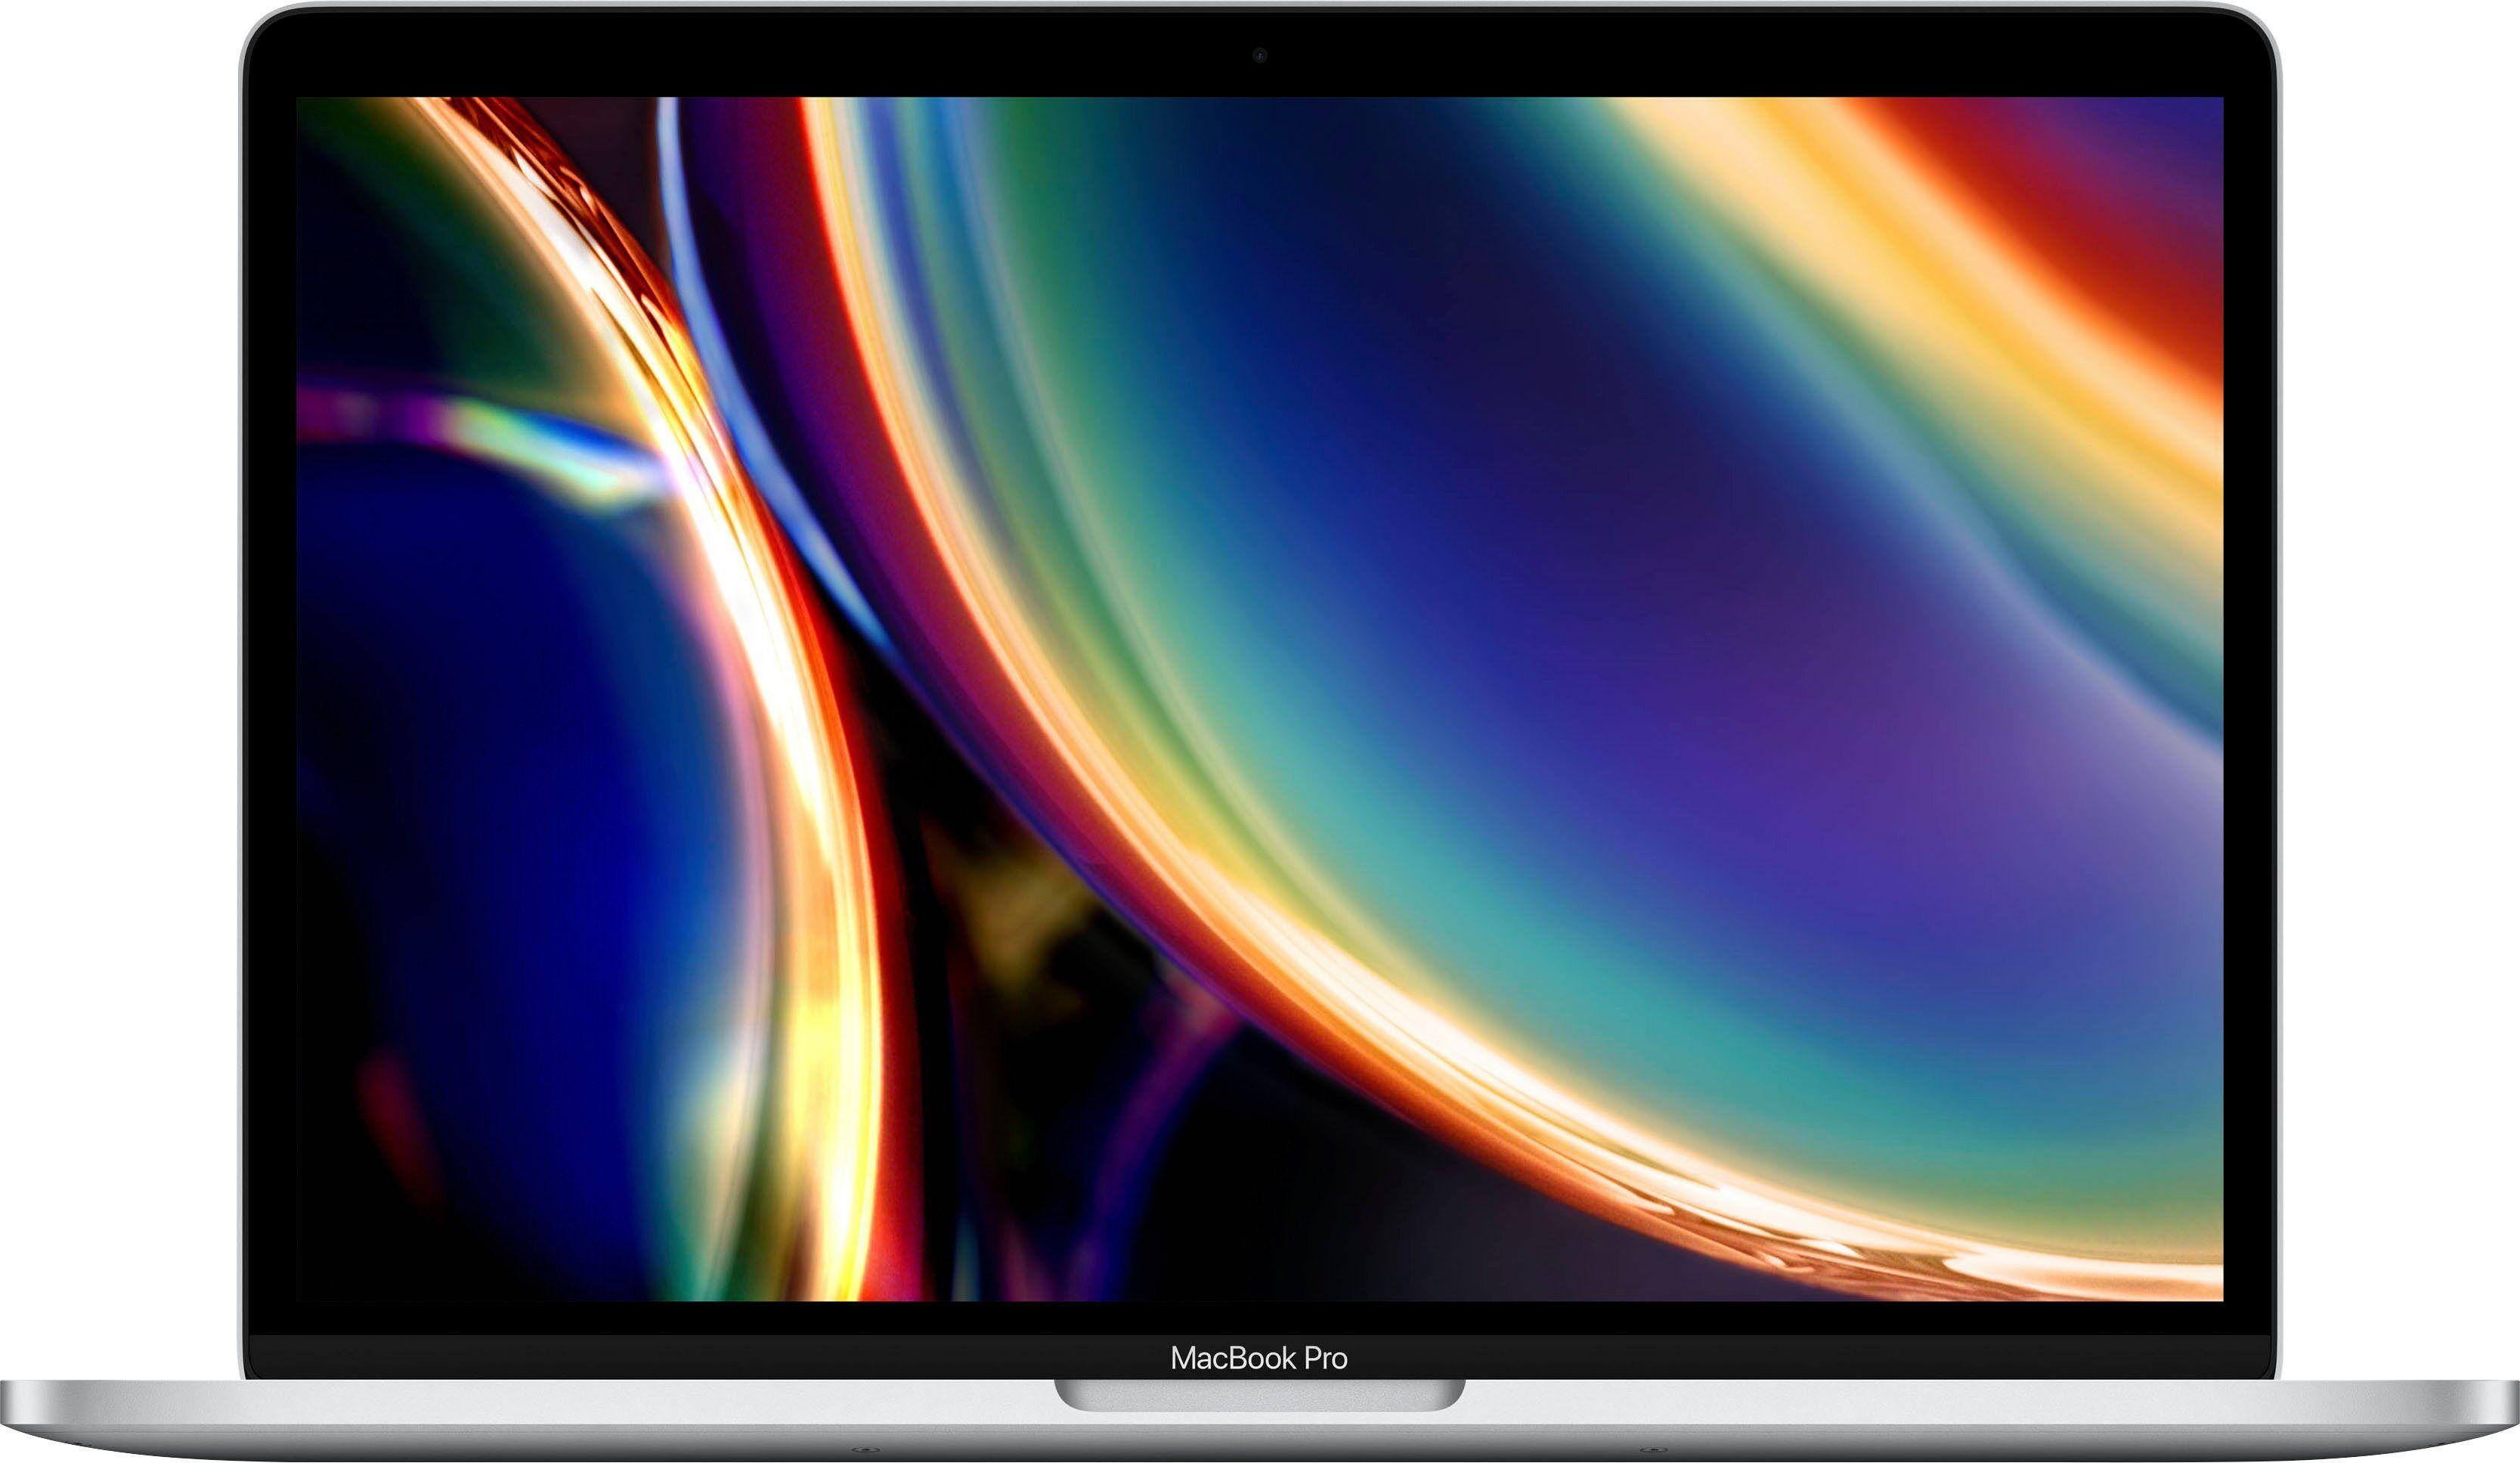 Apple MacBook Pro Notebook (33,78 cm/13,3 Zoll, Intel Core i5, Iris Plus Graphics 645, - GB HDD, 256 GB SSD), Silber